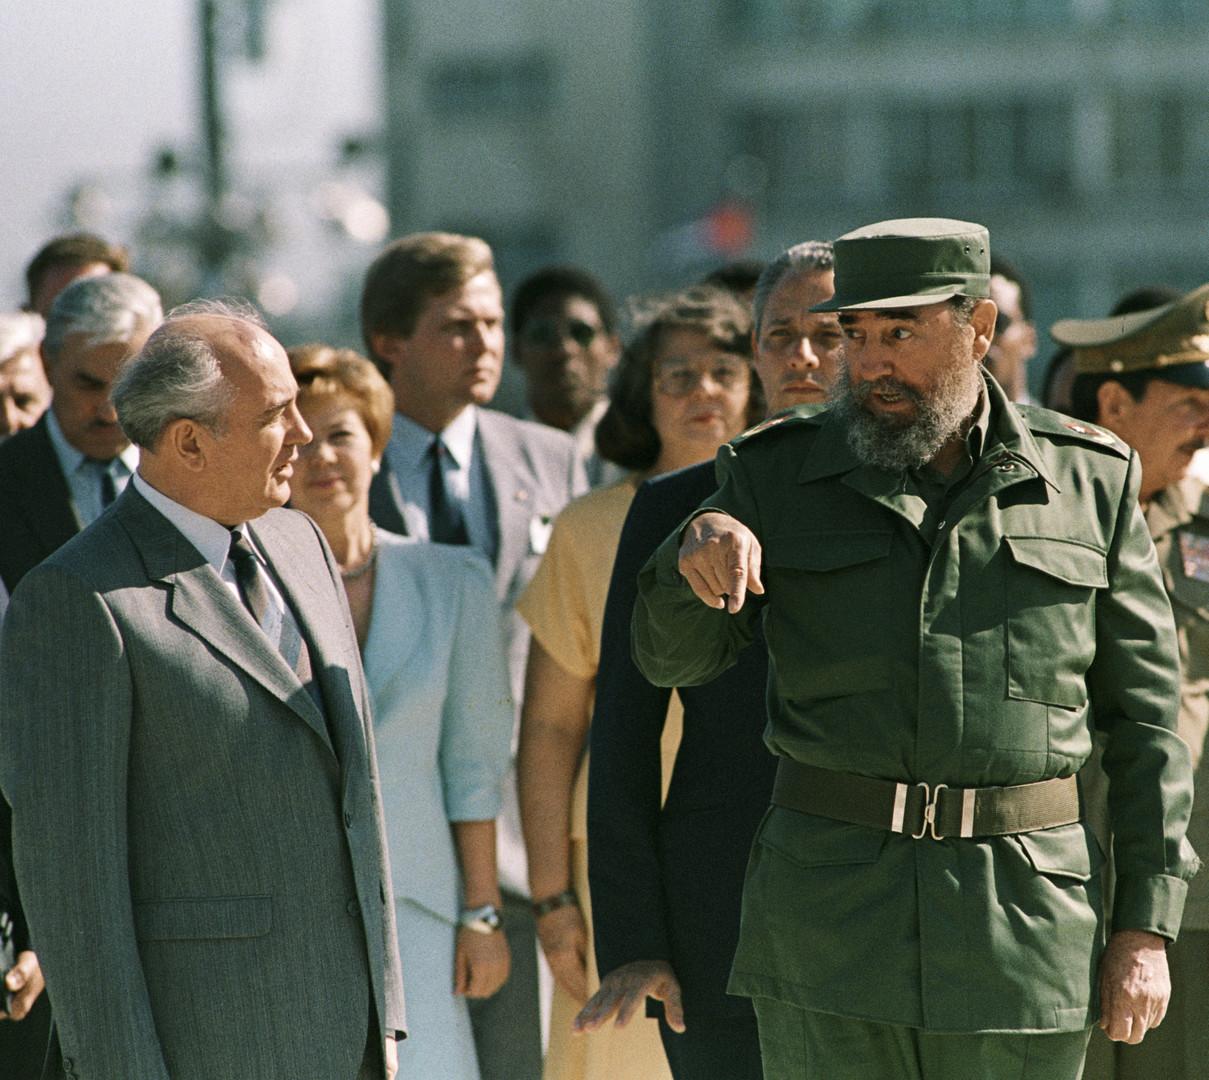 Жизнь Фиделя Кастро в фотографиях (фотогалерея) - page 2 | 1080x1209